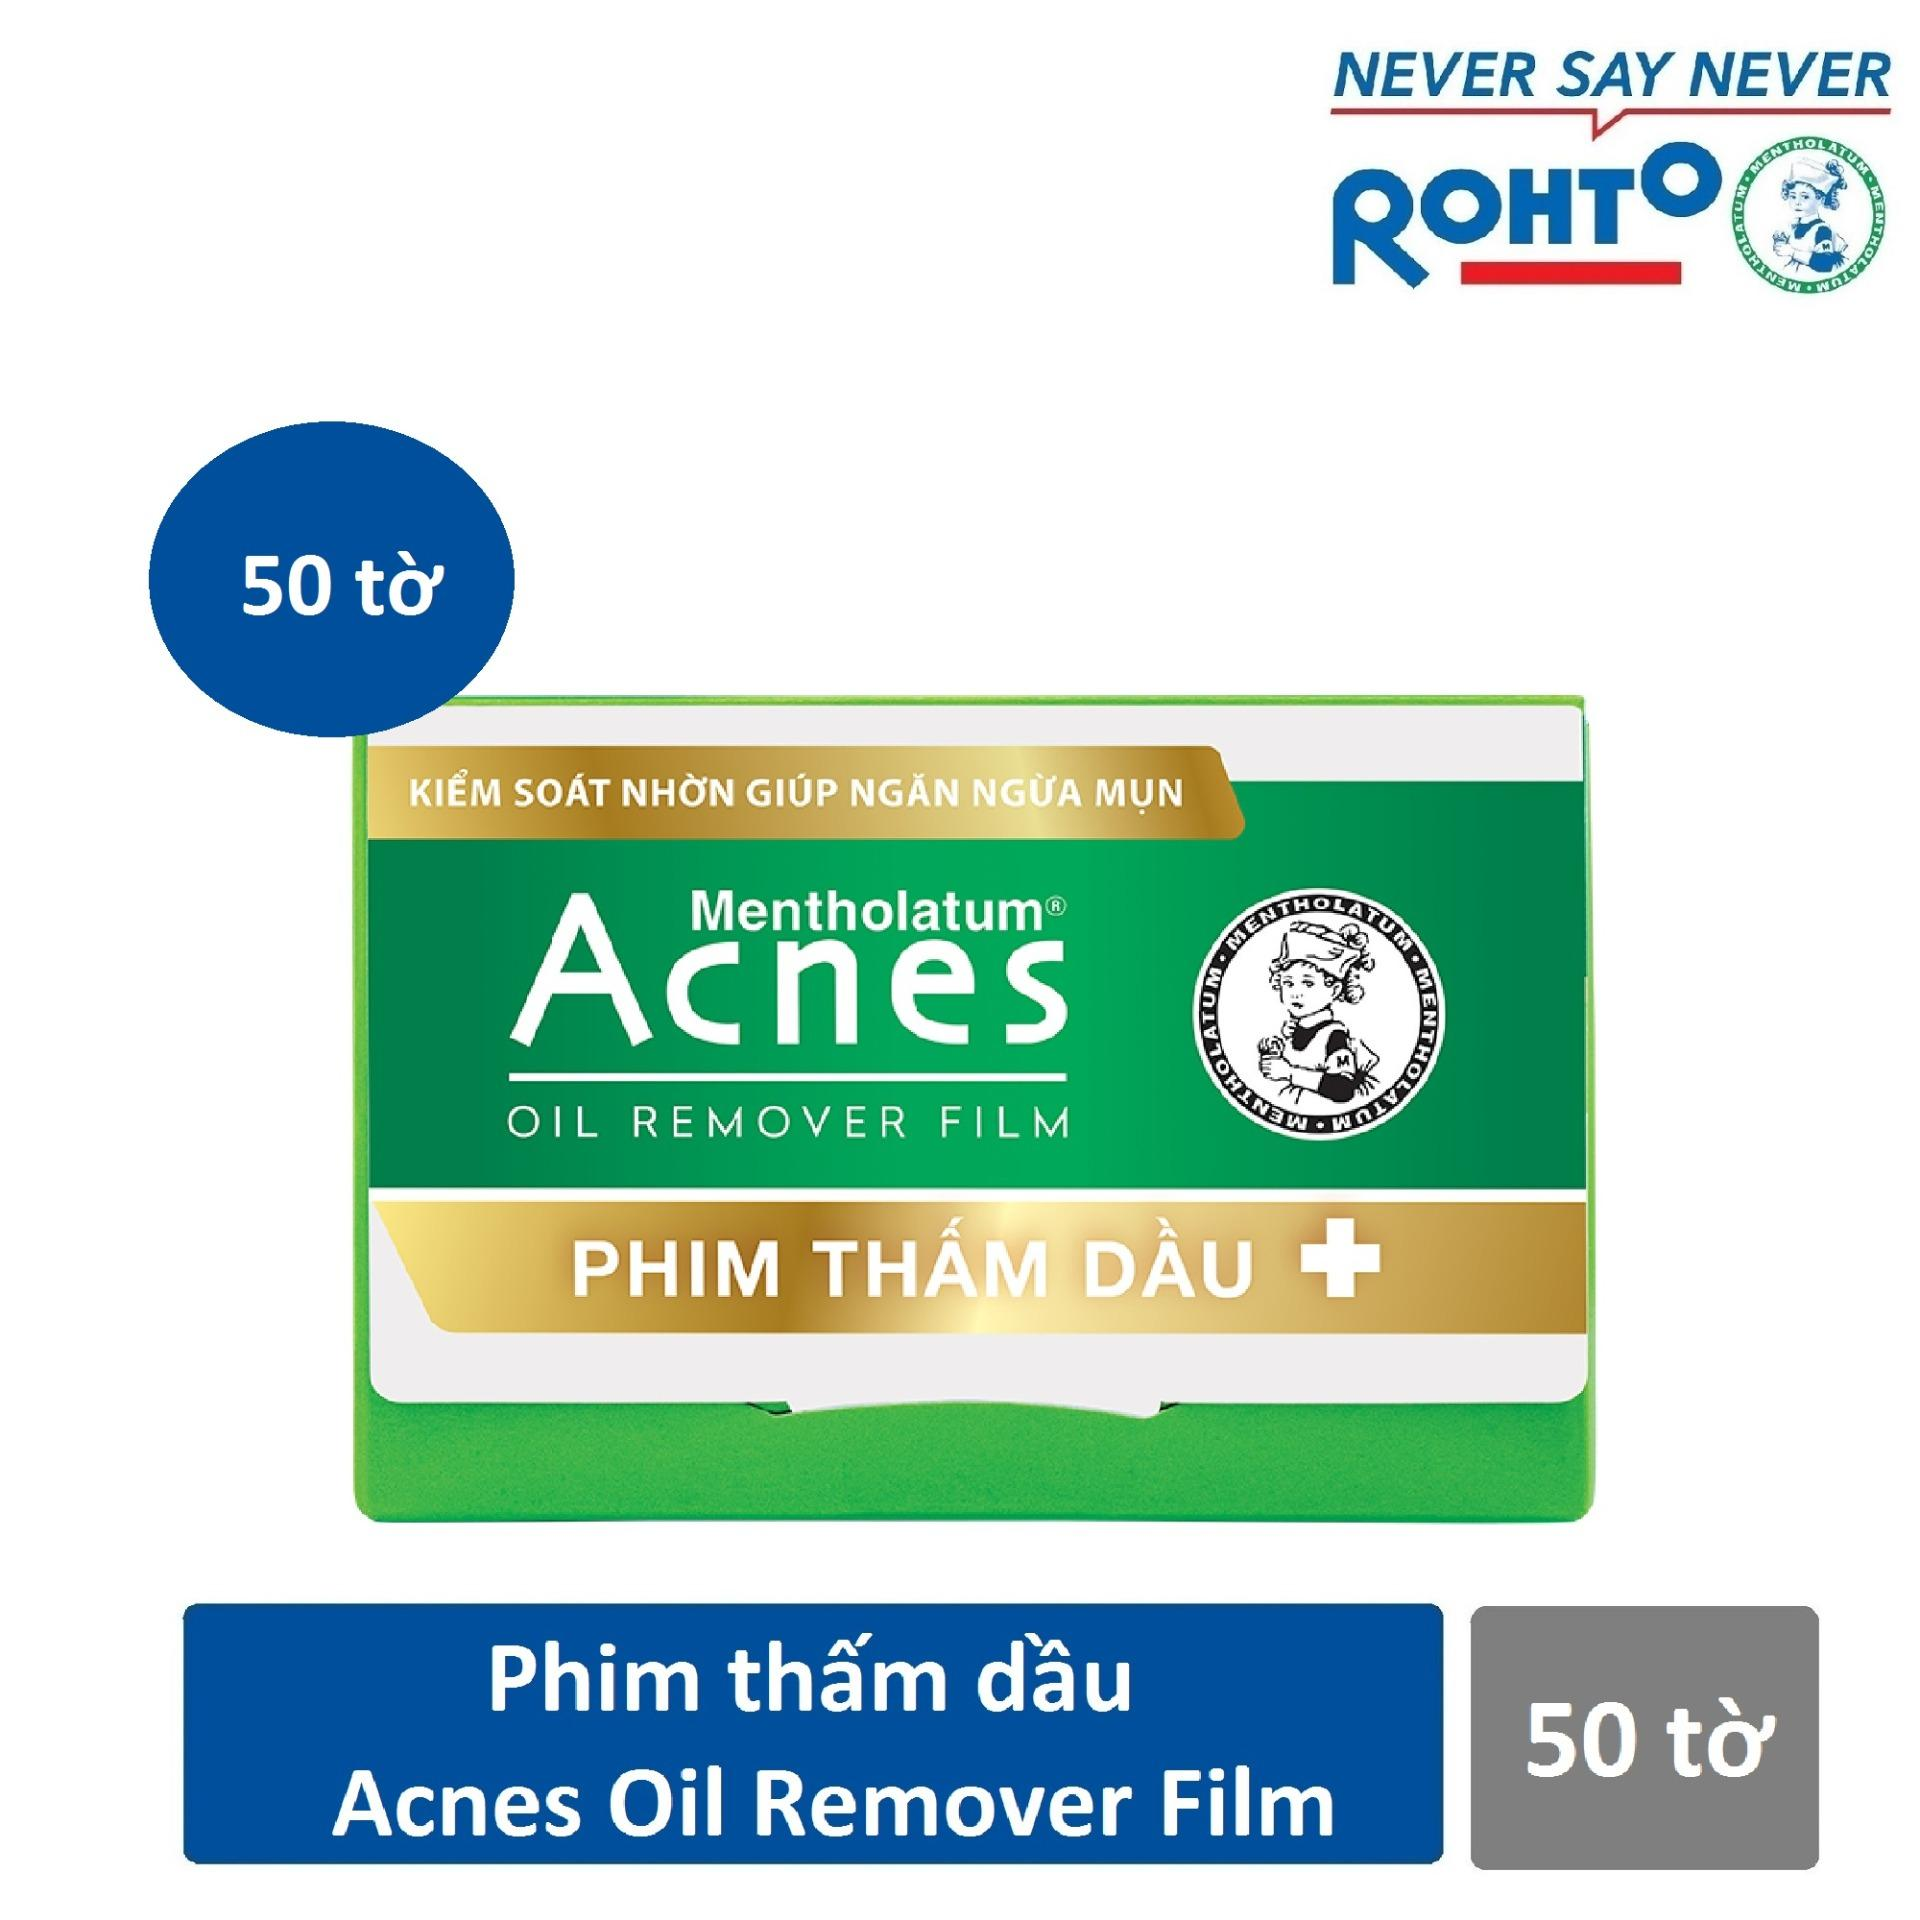 Phim thấm dầu Acnes Oil Remover Film 50 tờ tốt nhất